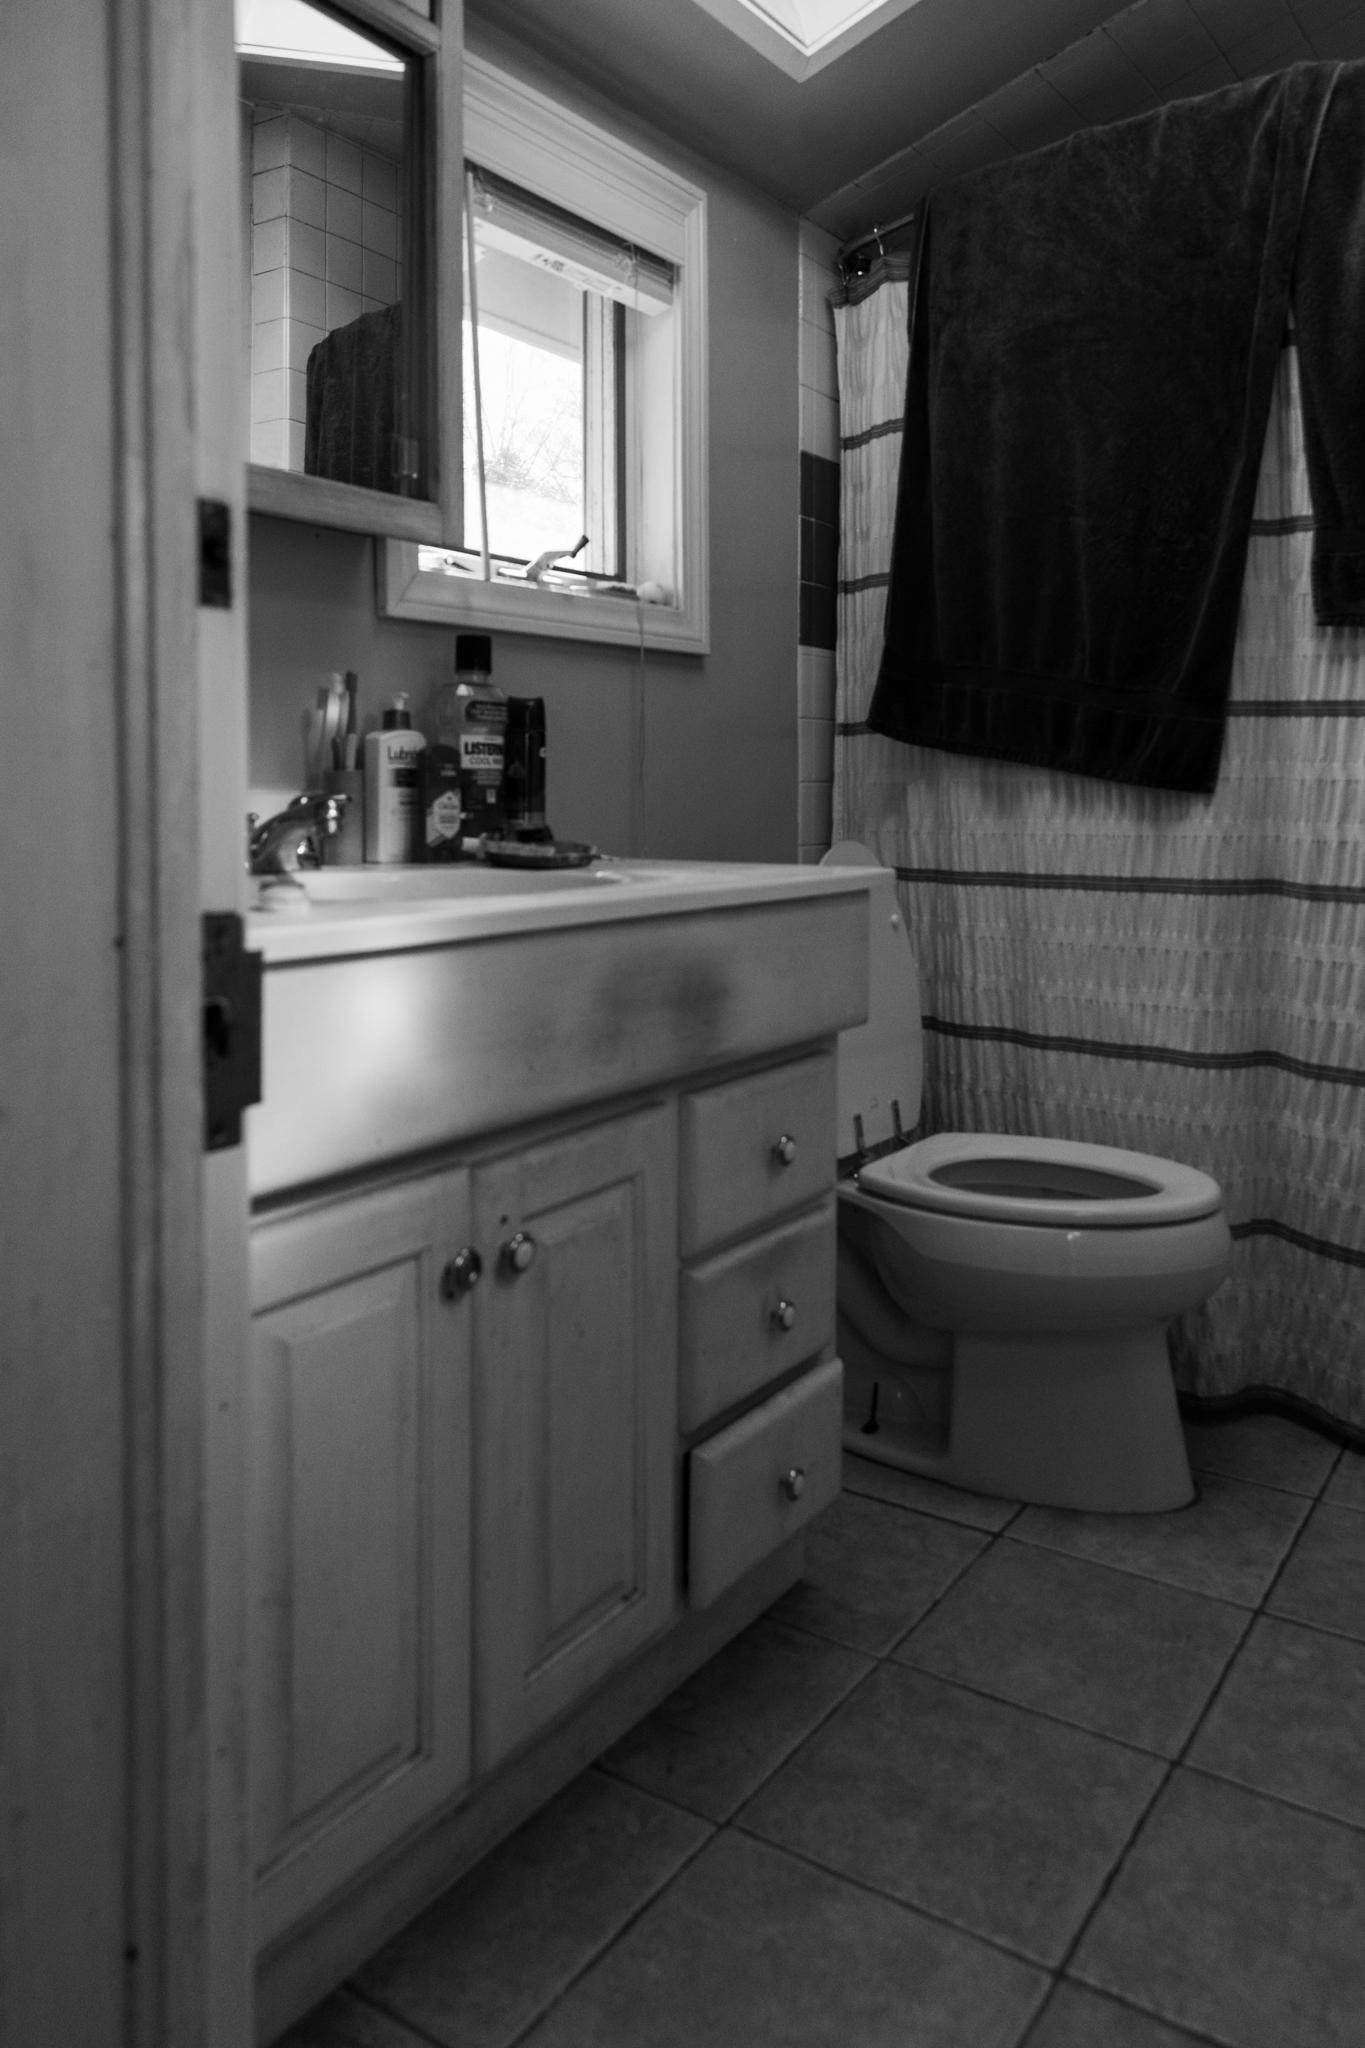 image of a bathroom viewed through a doorway